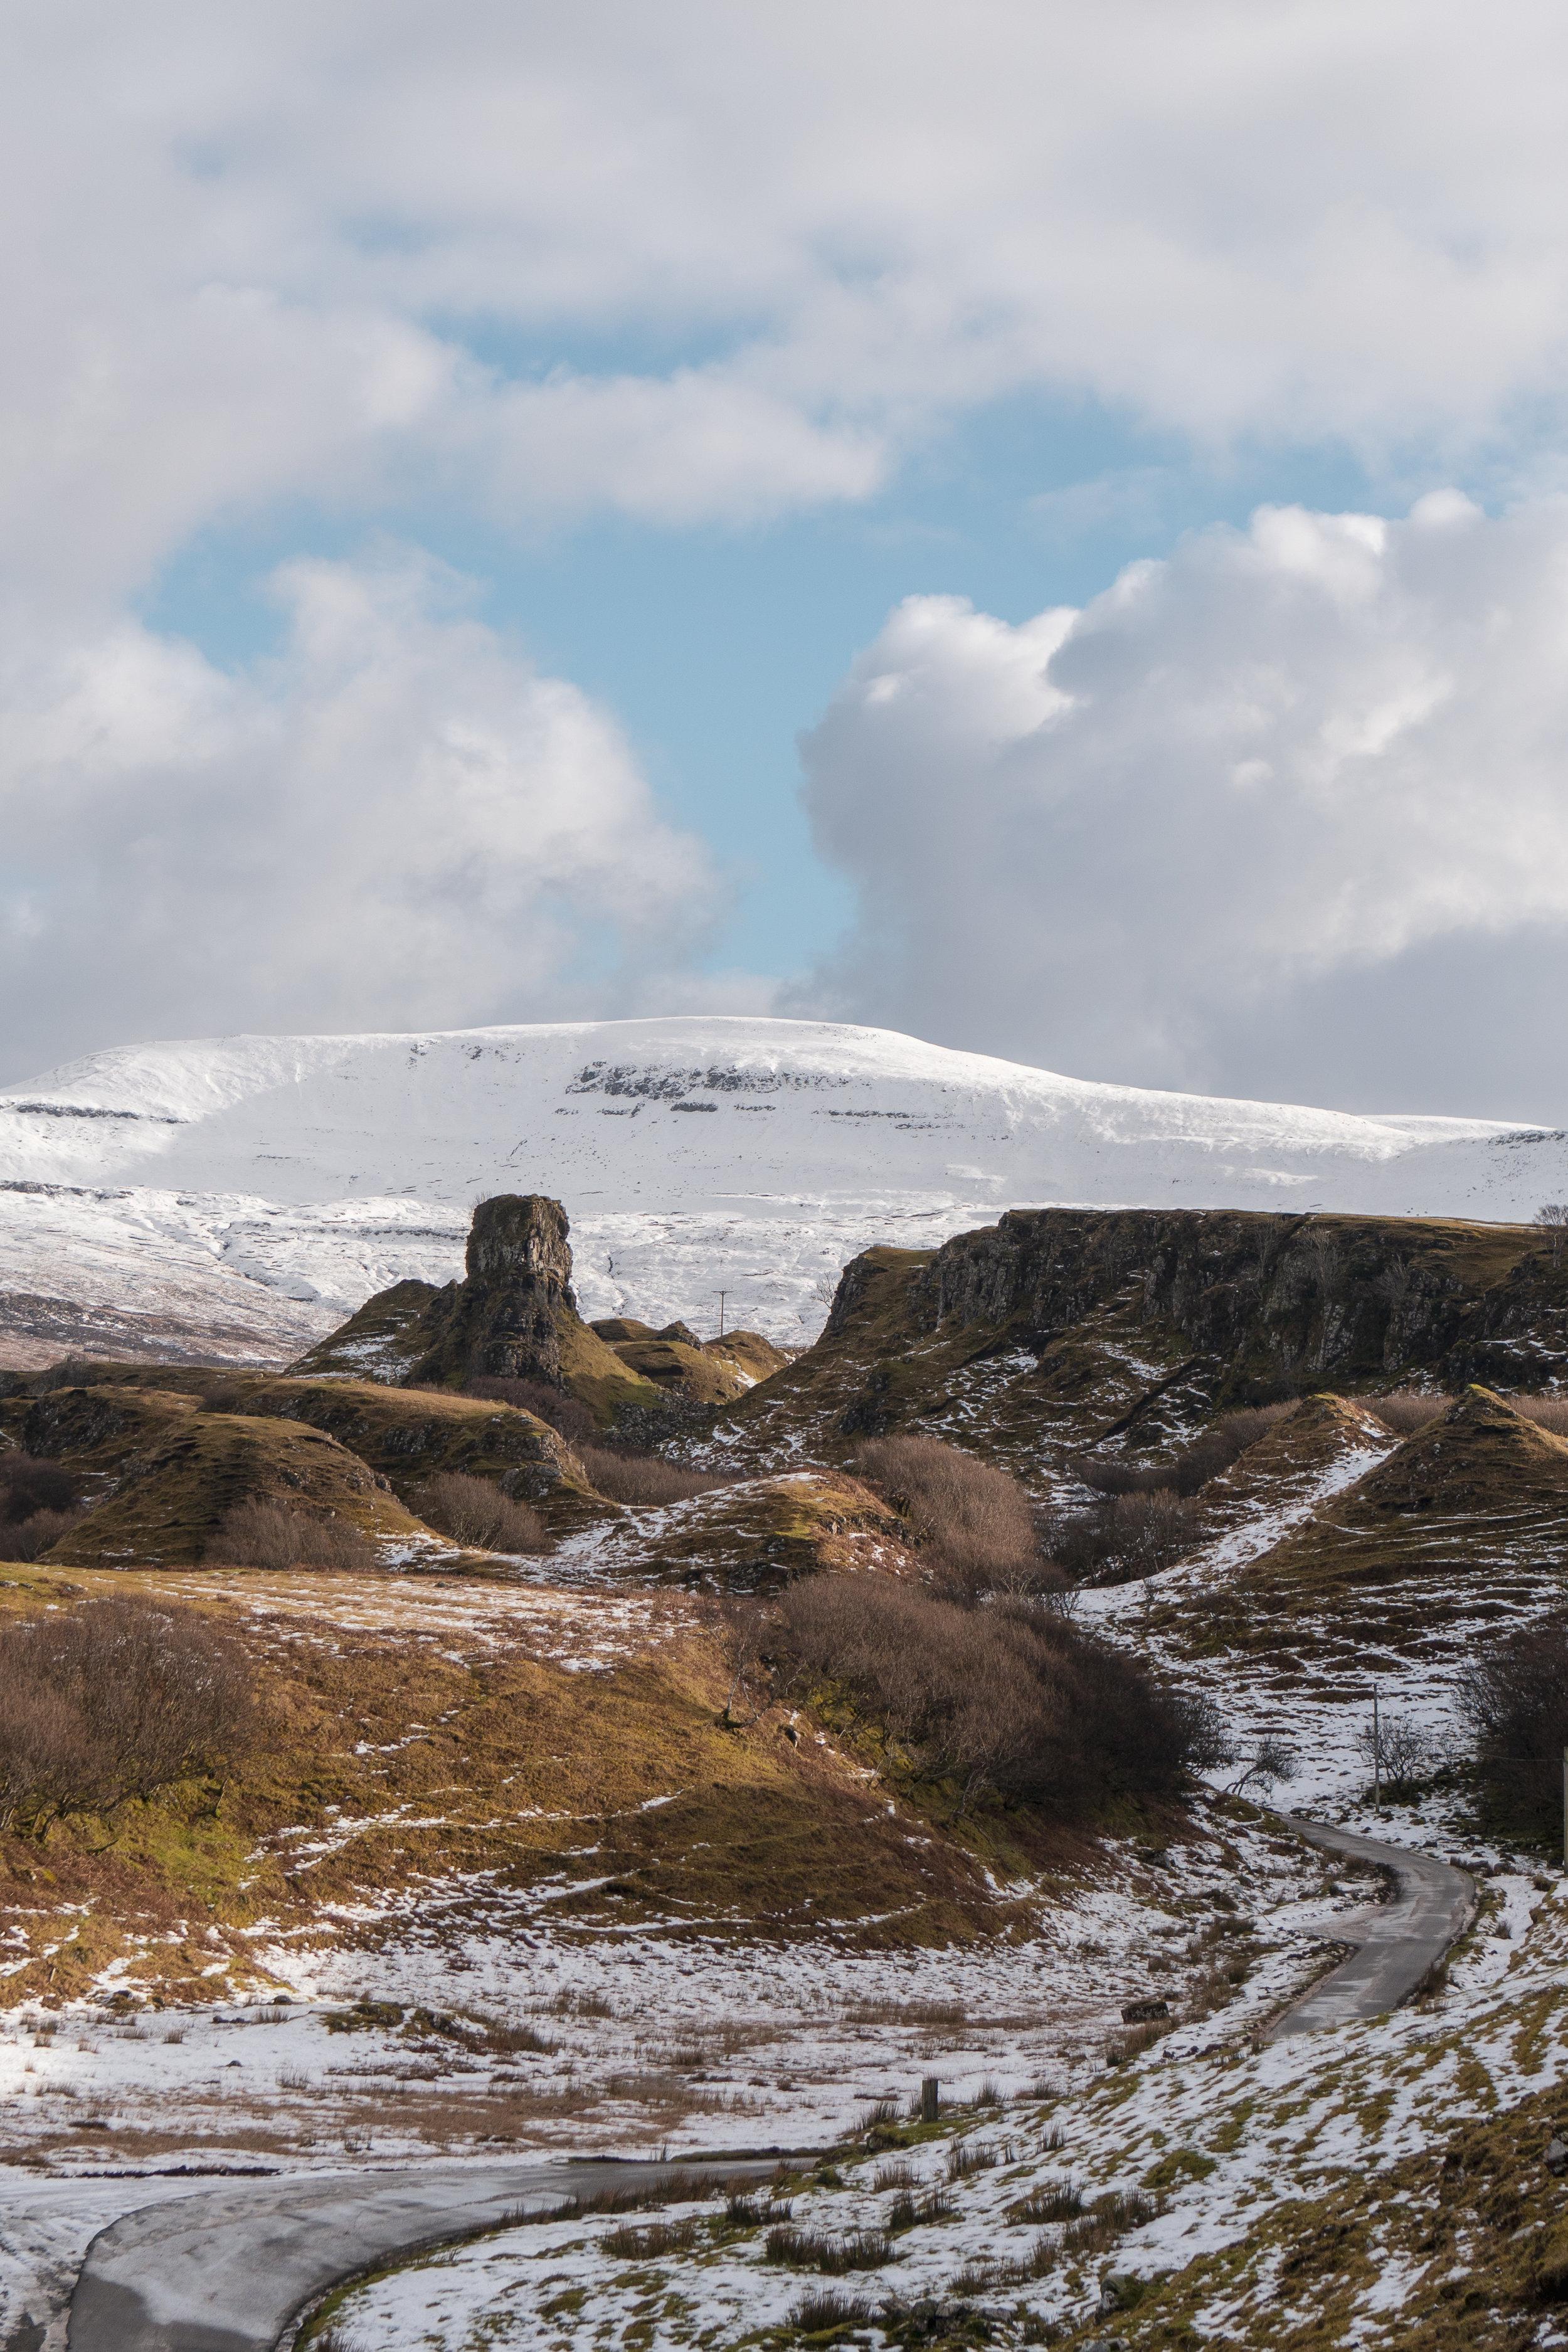 Isle-of-Skye-Fairy-Glen-und-Braes (21).jpg